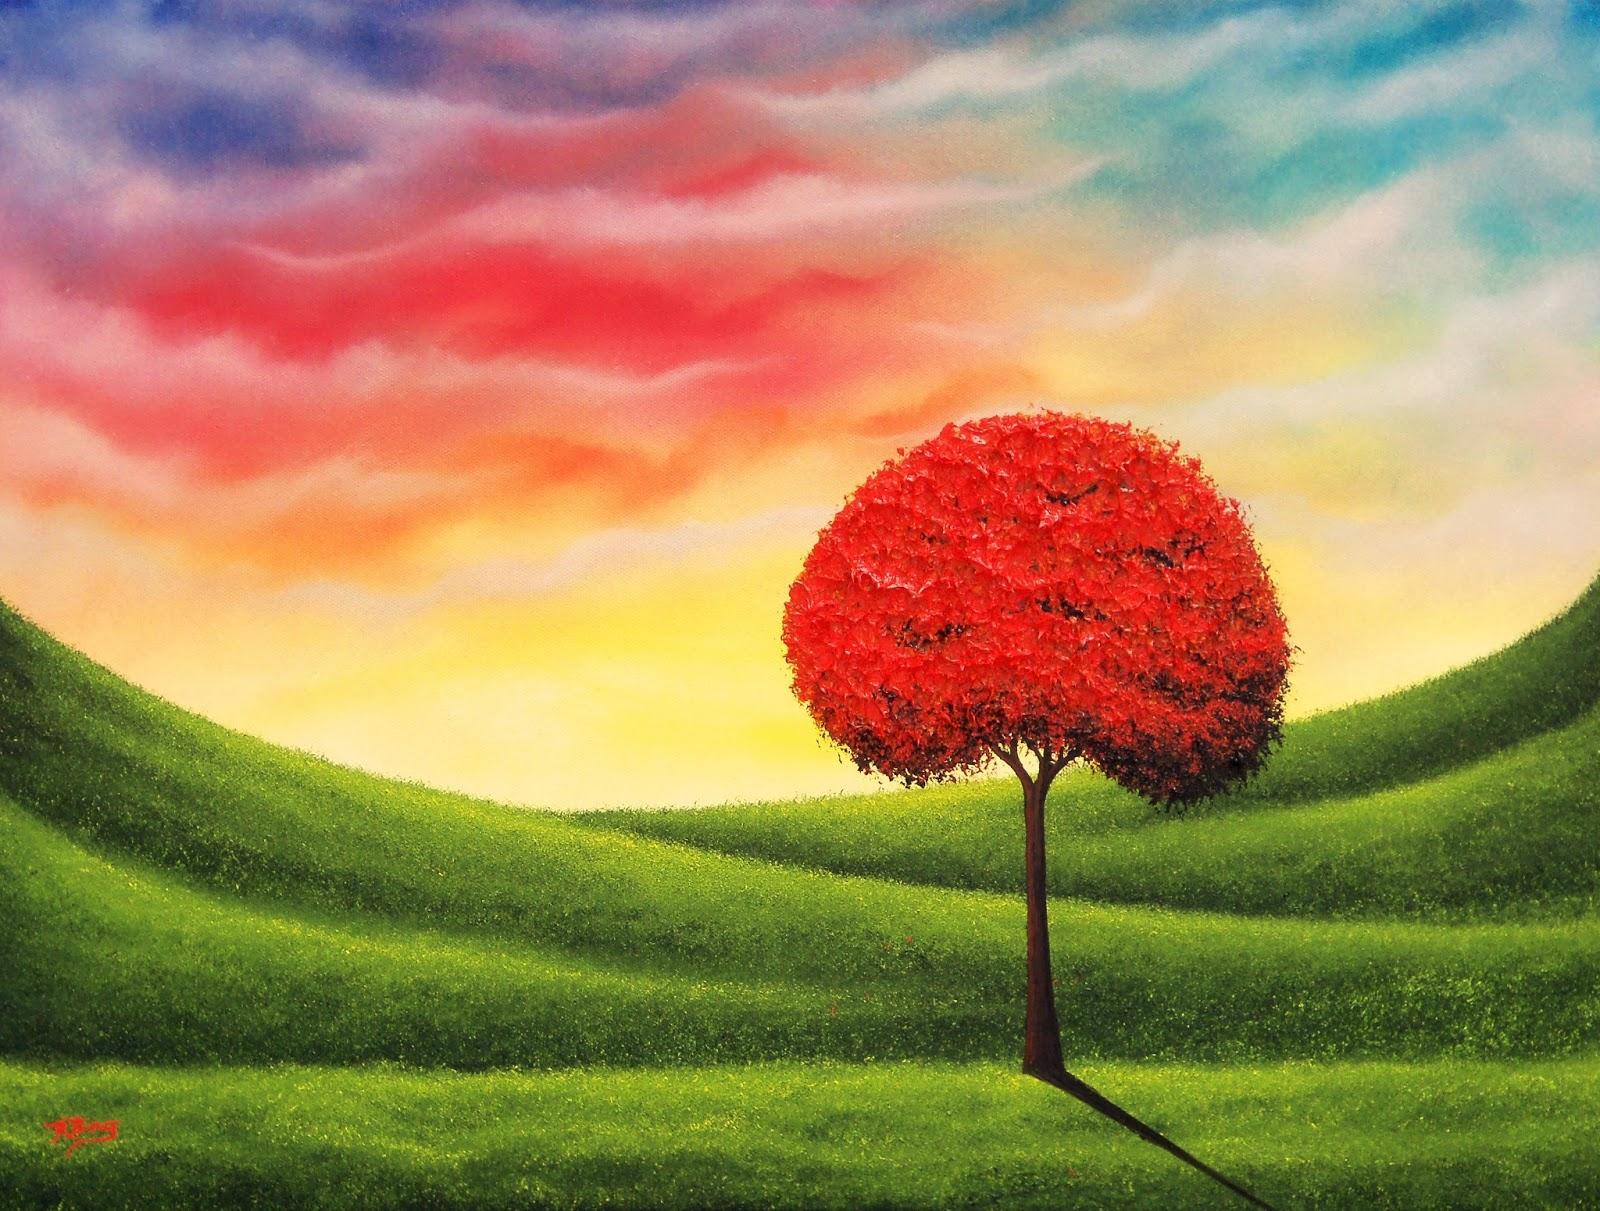 Red Tree Landscape Painting Sunset Sky Art 18 X 24 Original Oil